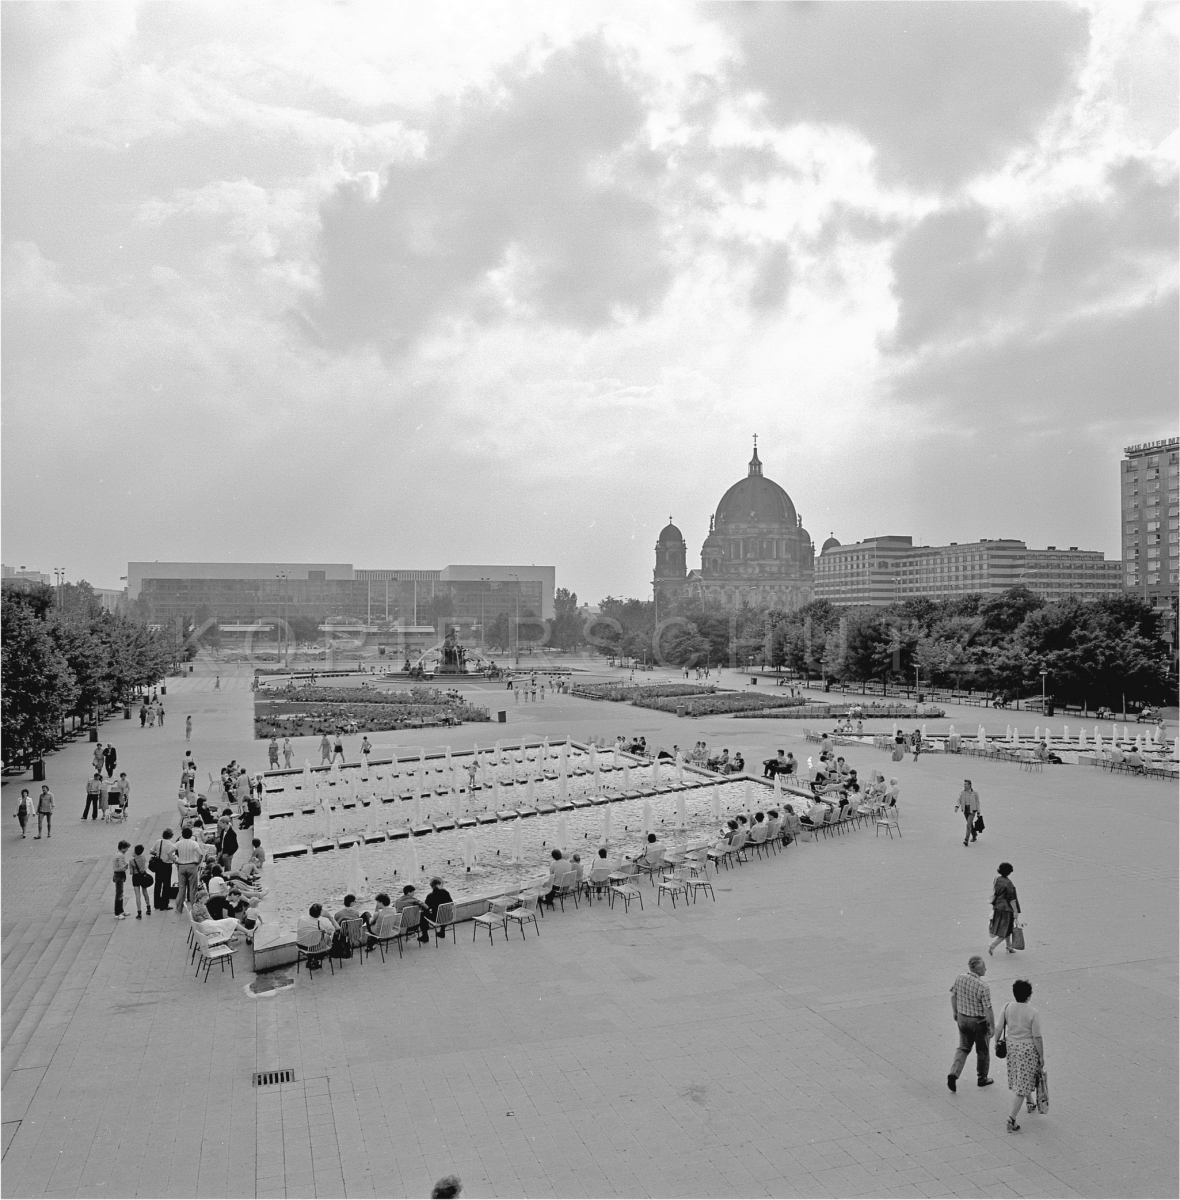 Nr01-074_Palast-der-Republik-19.6.1985